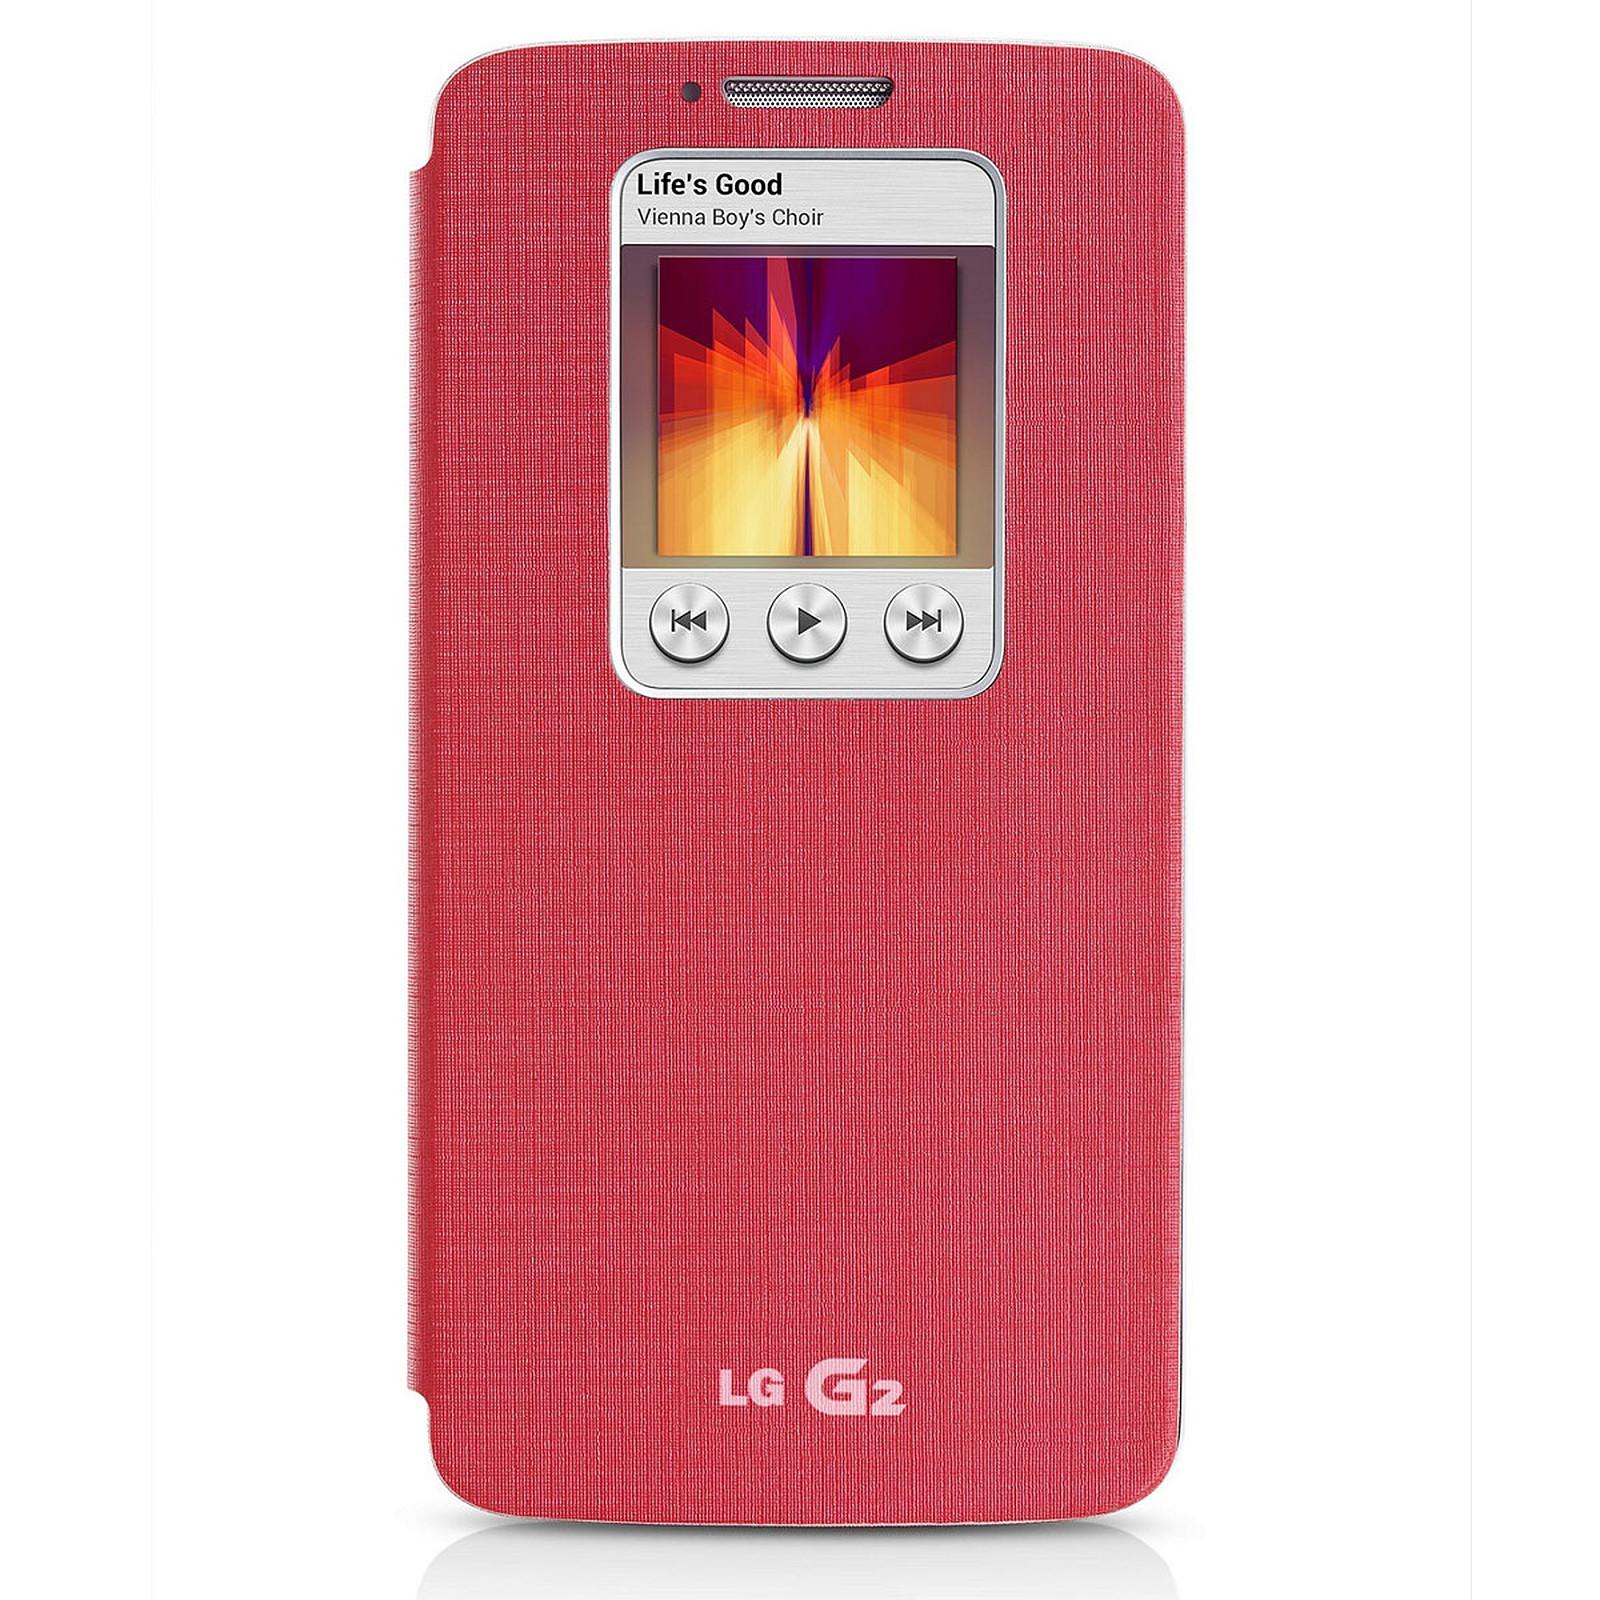 LG Etui Quick Window Case Rose pour LG G2